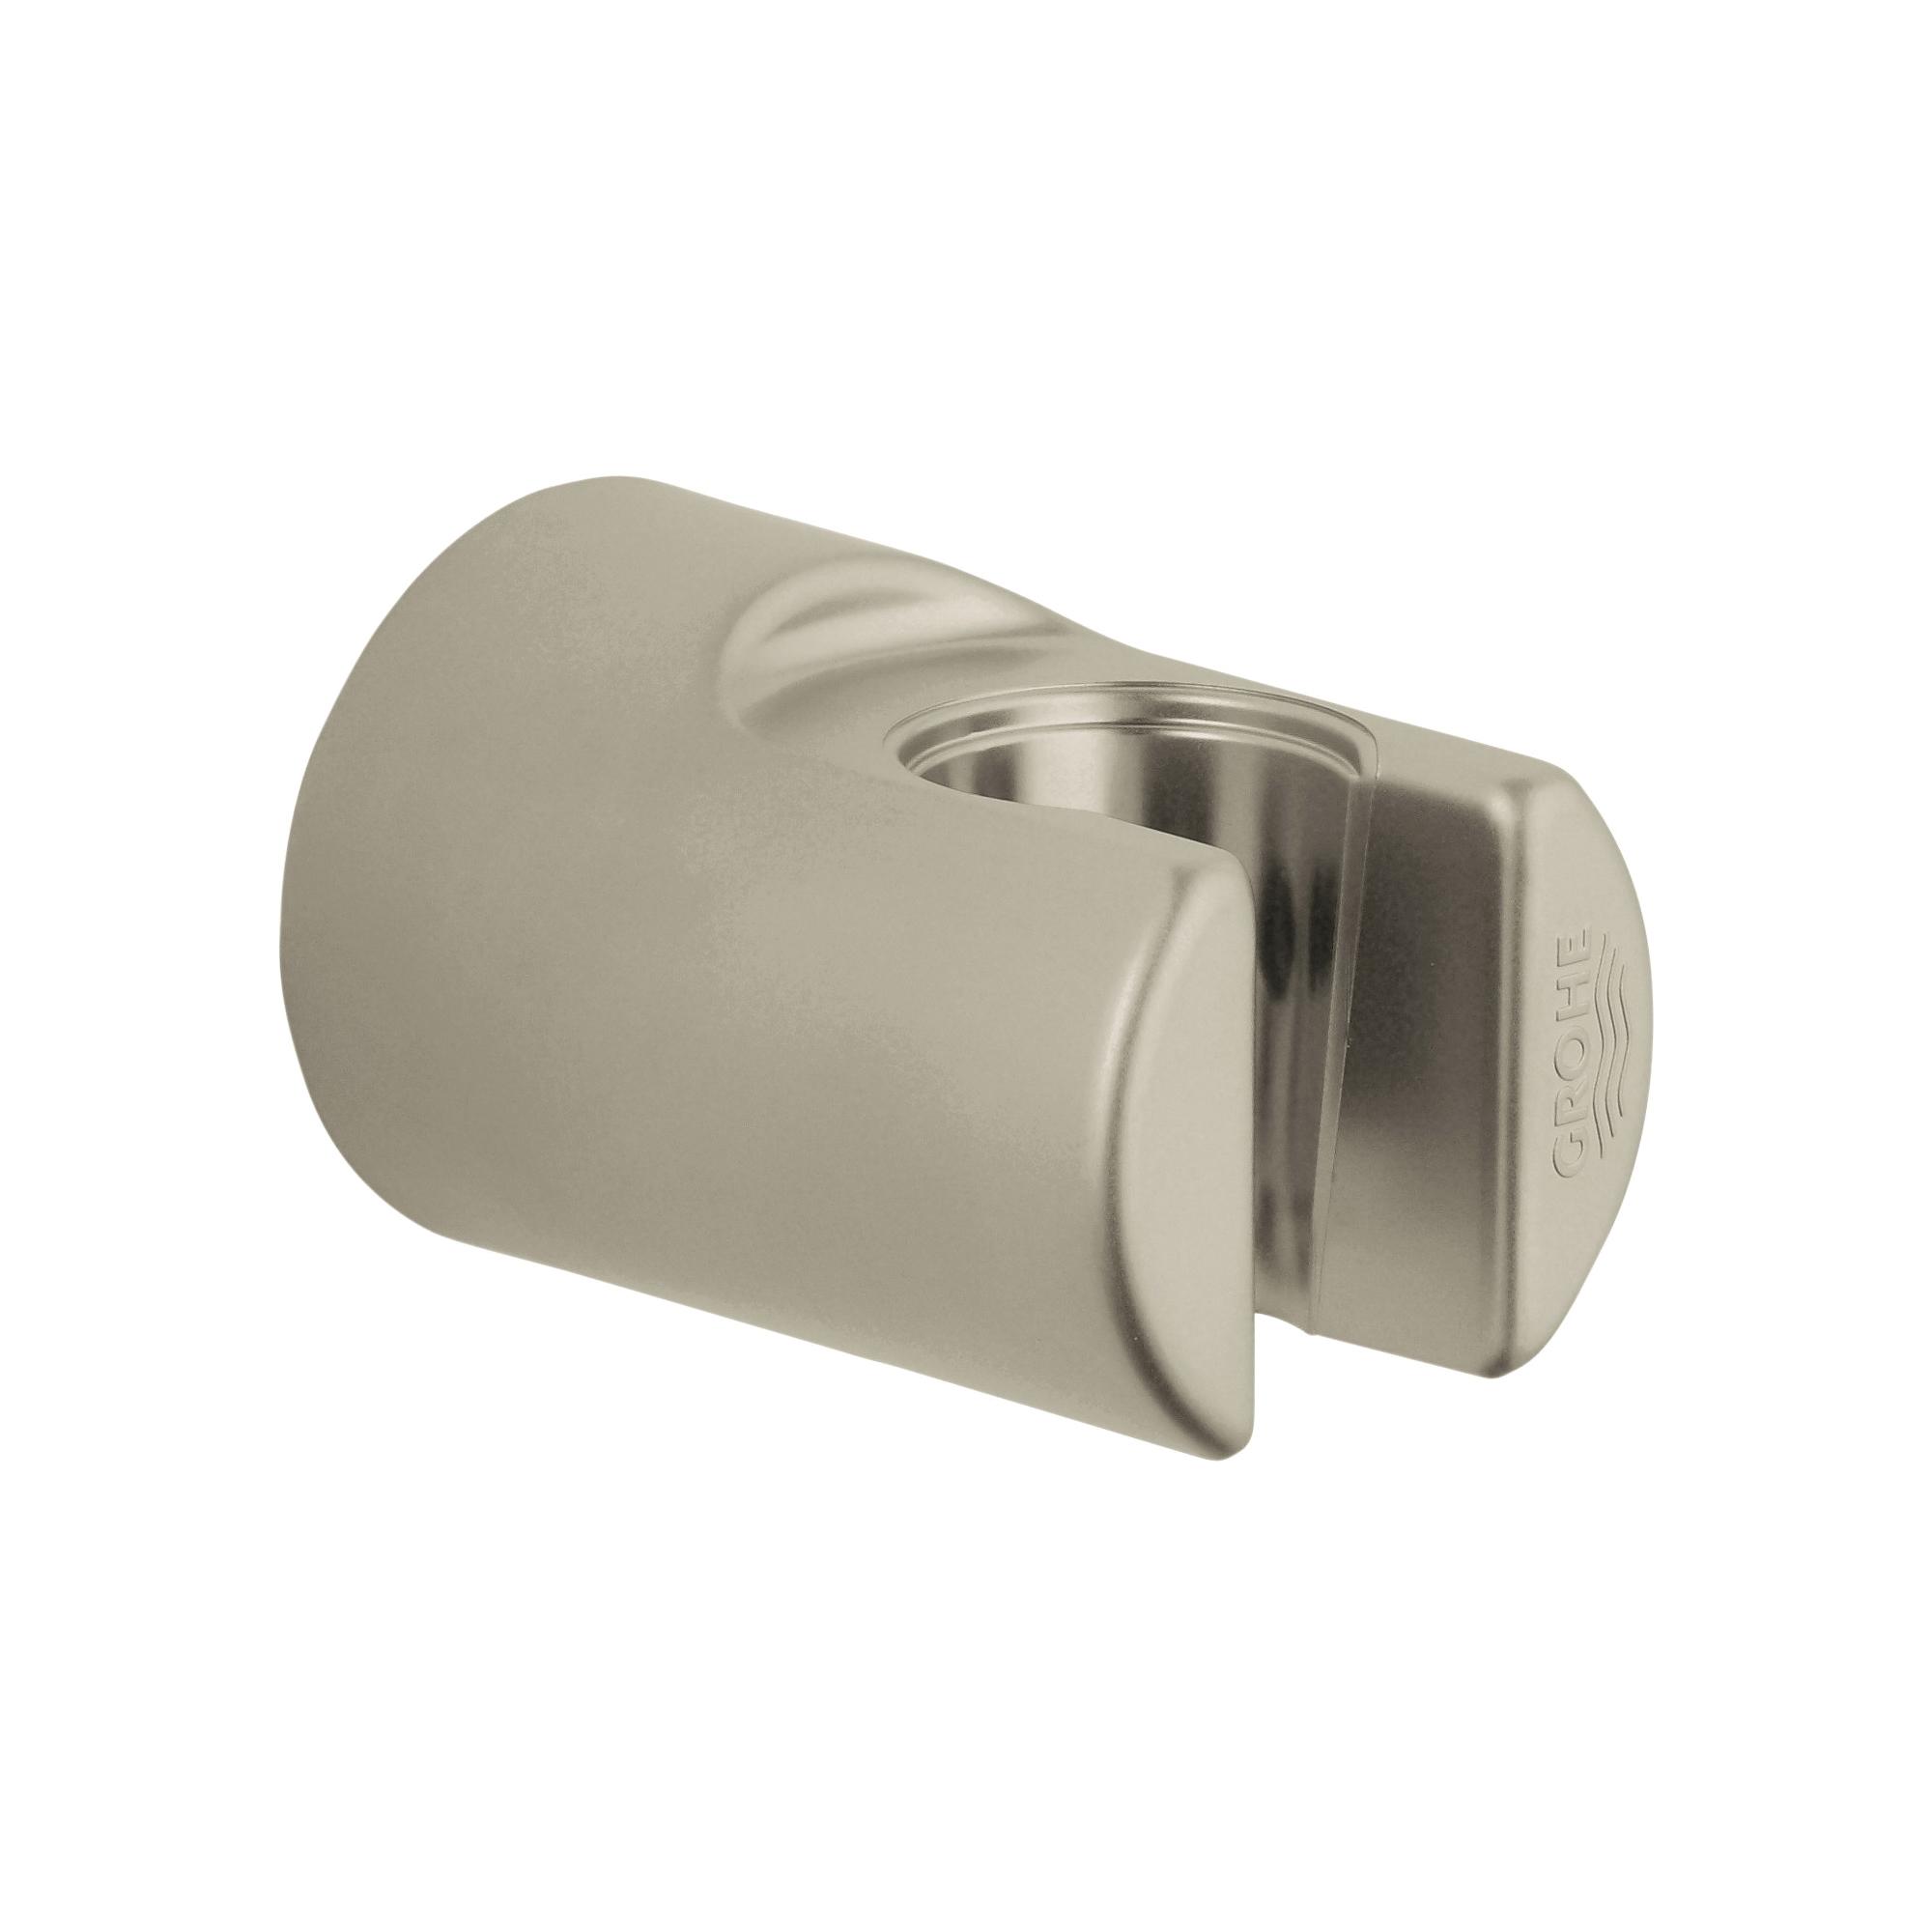 GROHE 28622EN0 Relexa Hand Shower Holder, Wall Mount, Import